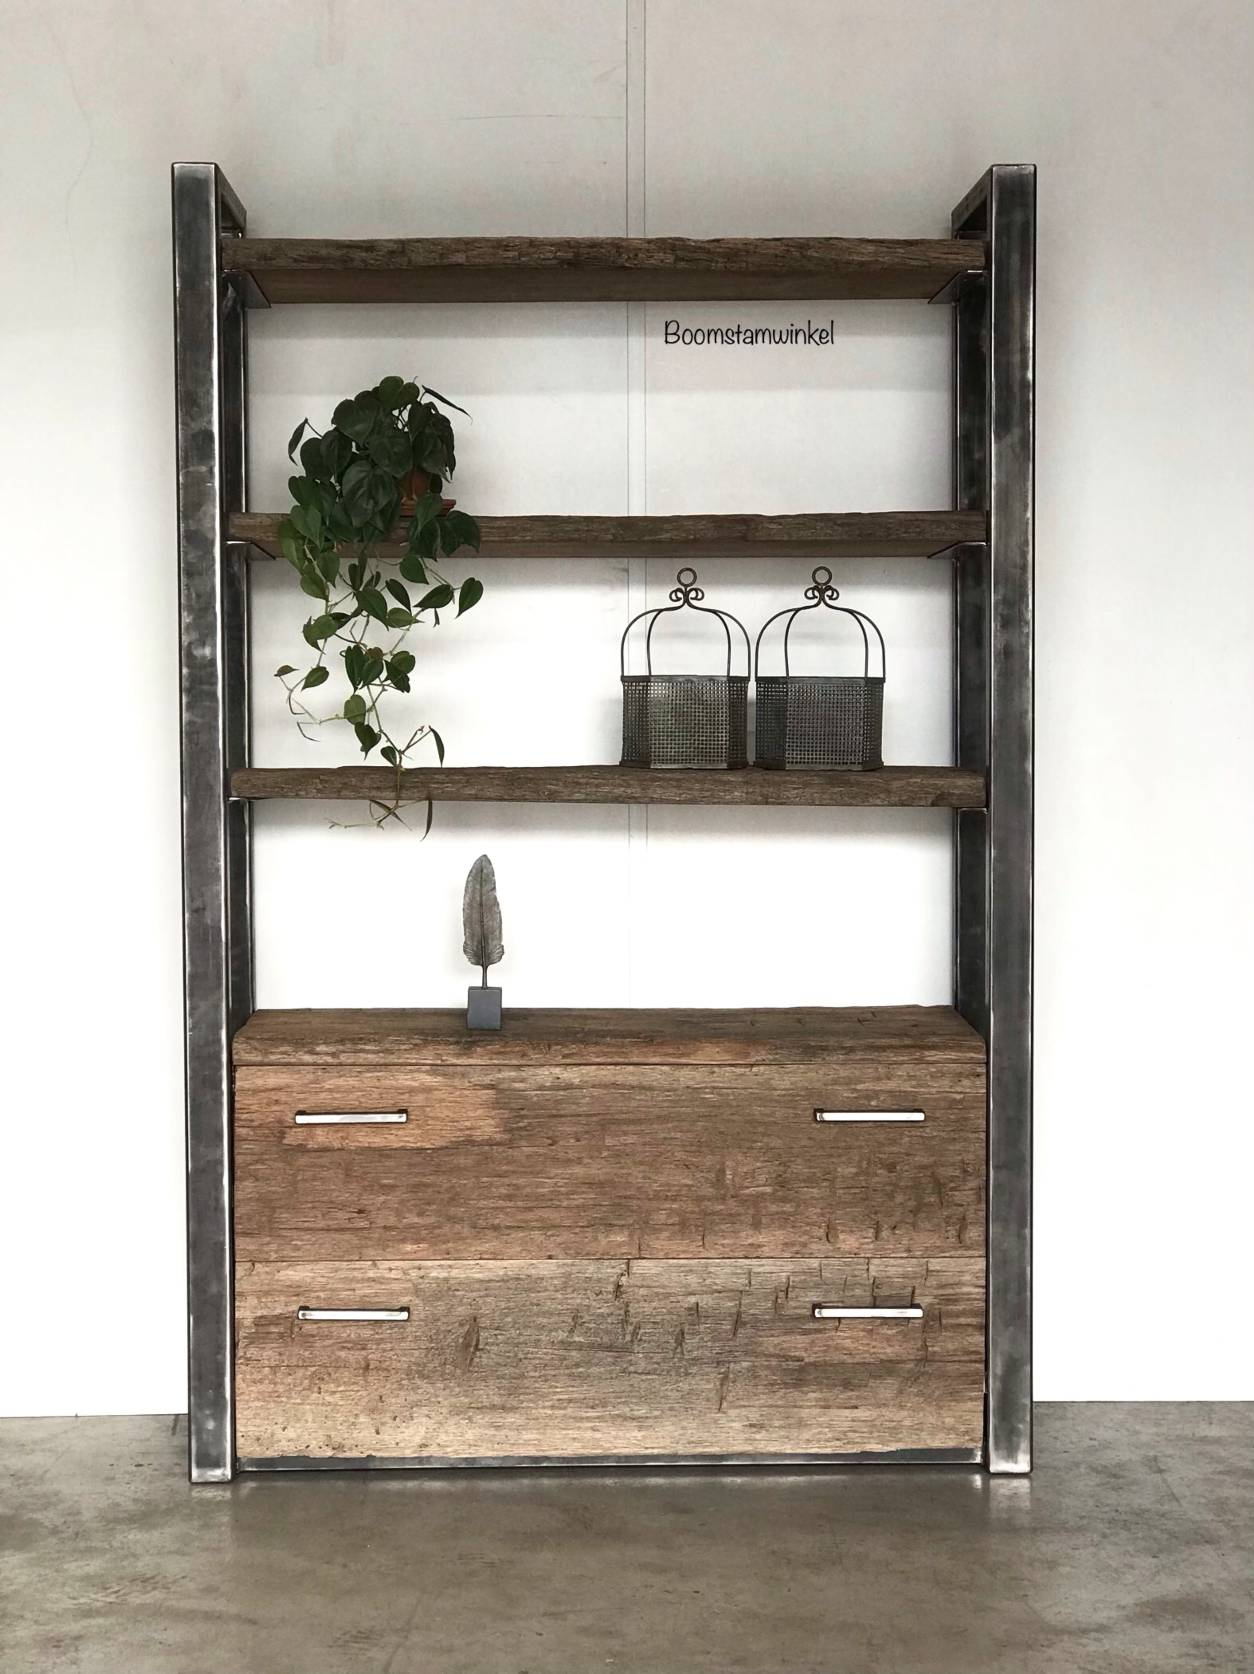 Zwart Bruine Tv Kast.Industriele Wandkast Kast Hout En Staal Open Kast Boomstamwinkel